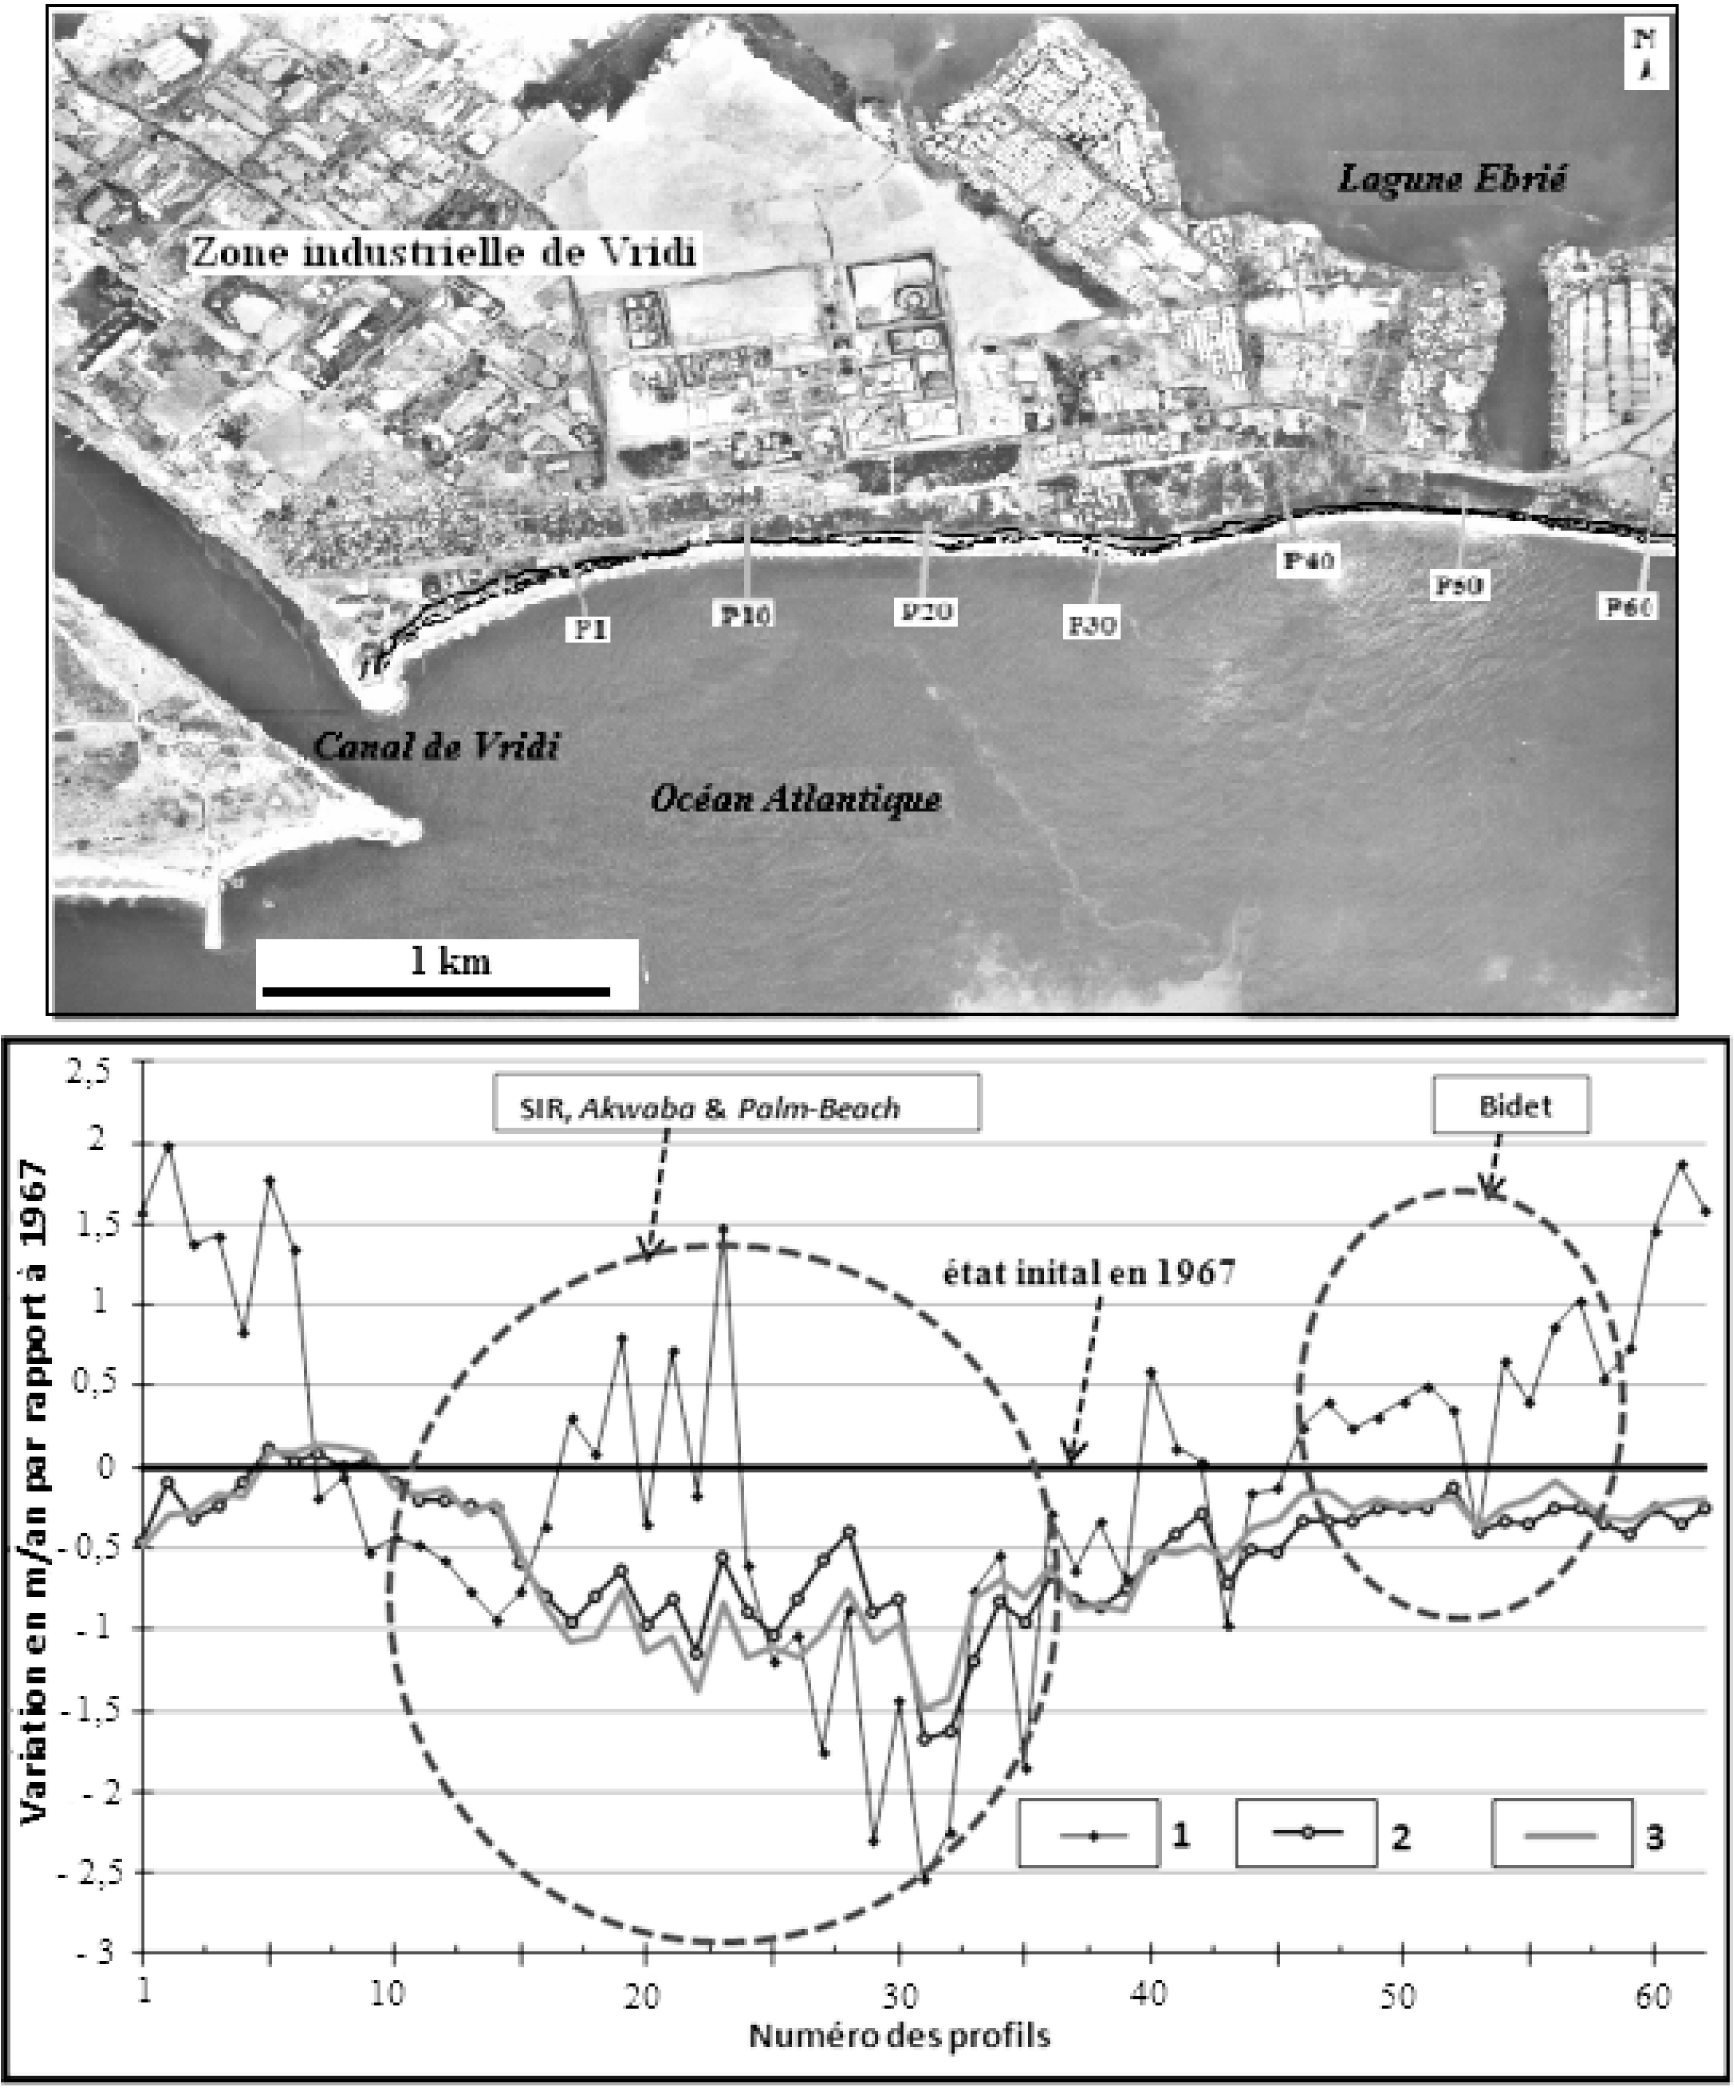 Url http journals openedition org geomorphologie docannexe image 9990 img 7 png